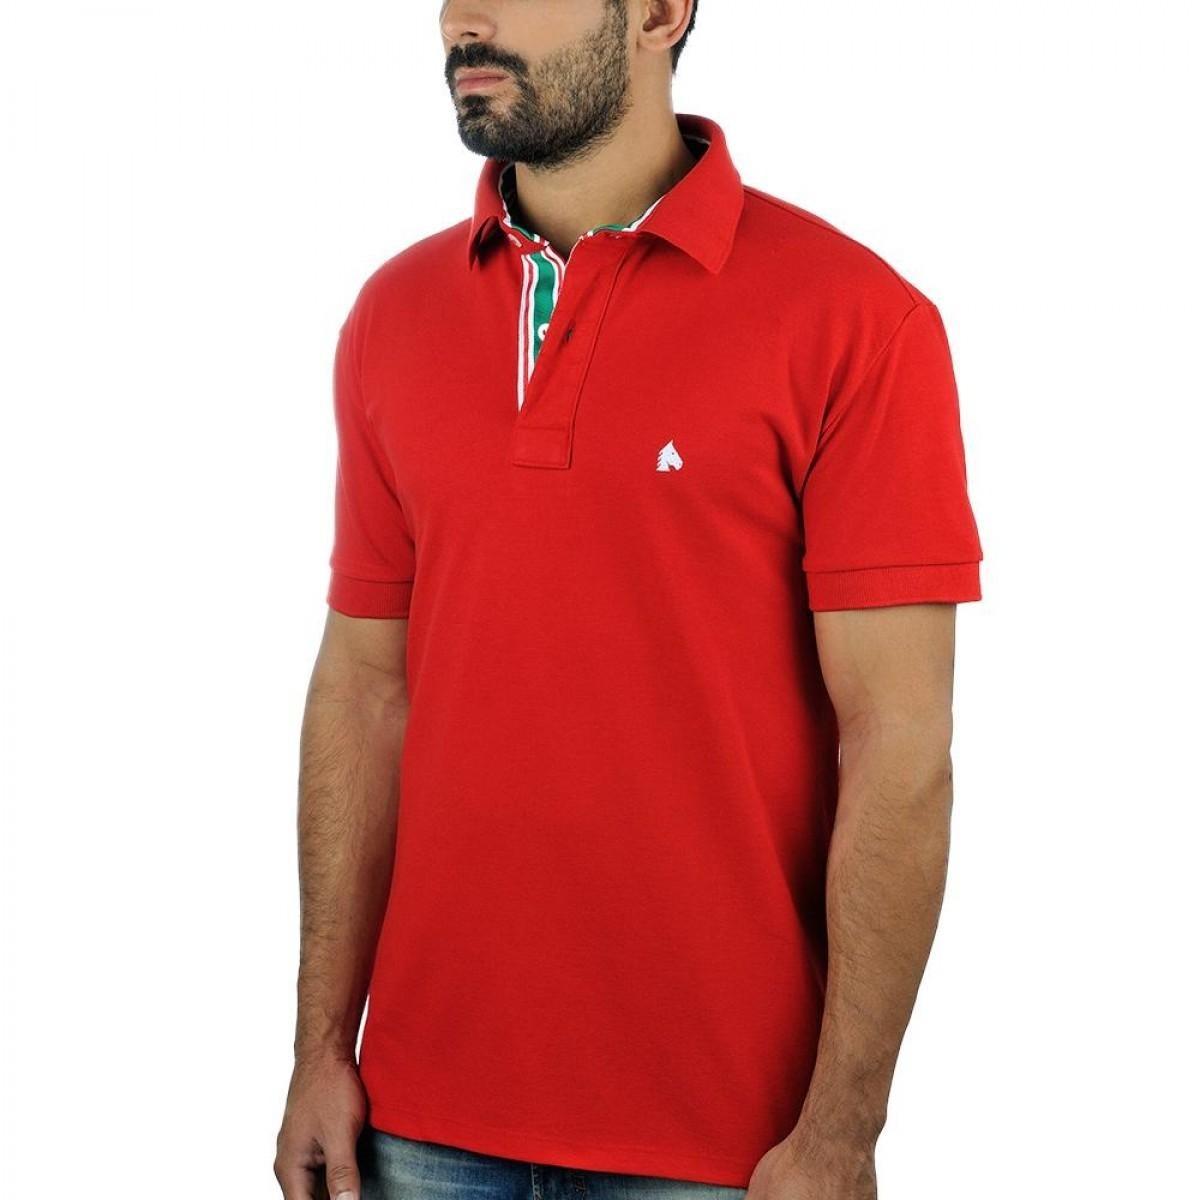 3bc4a27ad camiseta pólo masculina bf   ms vermelha cp018. Carregando zoom.